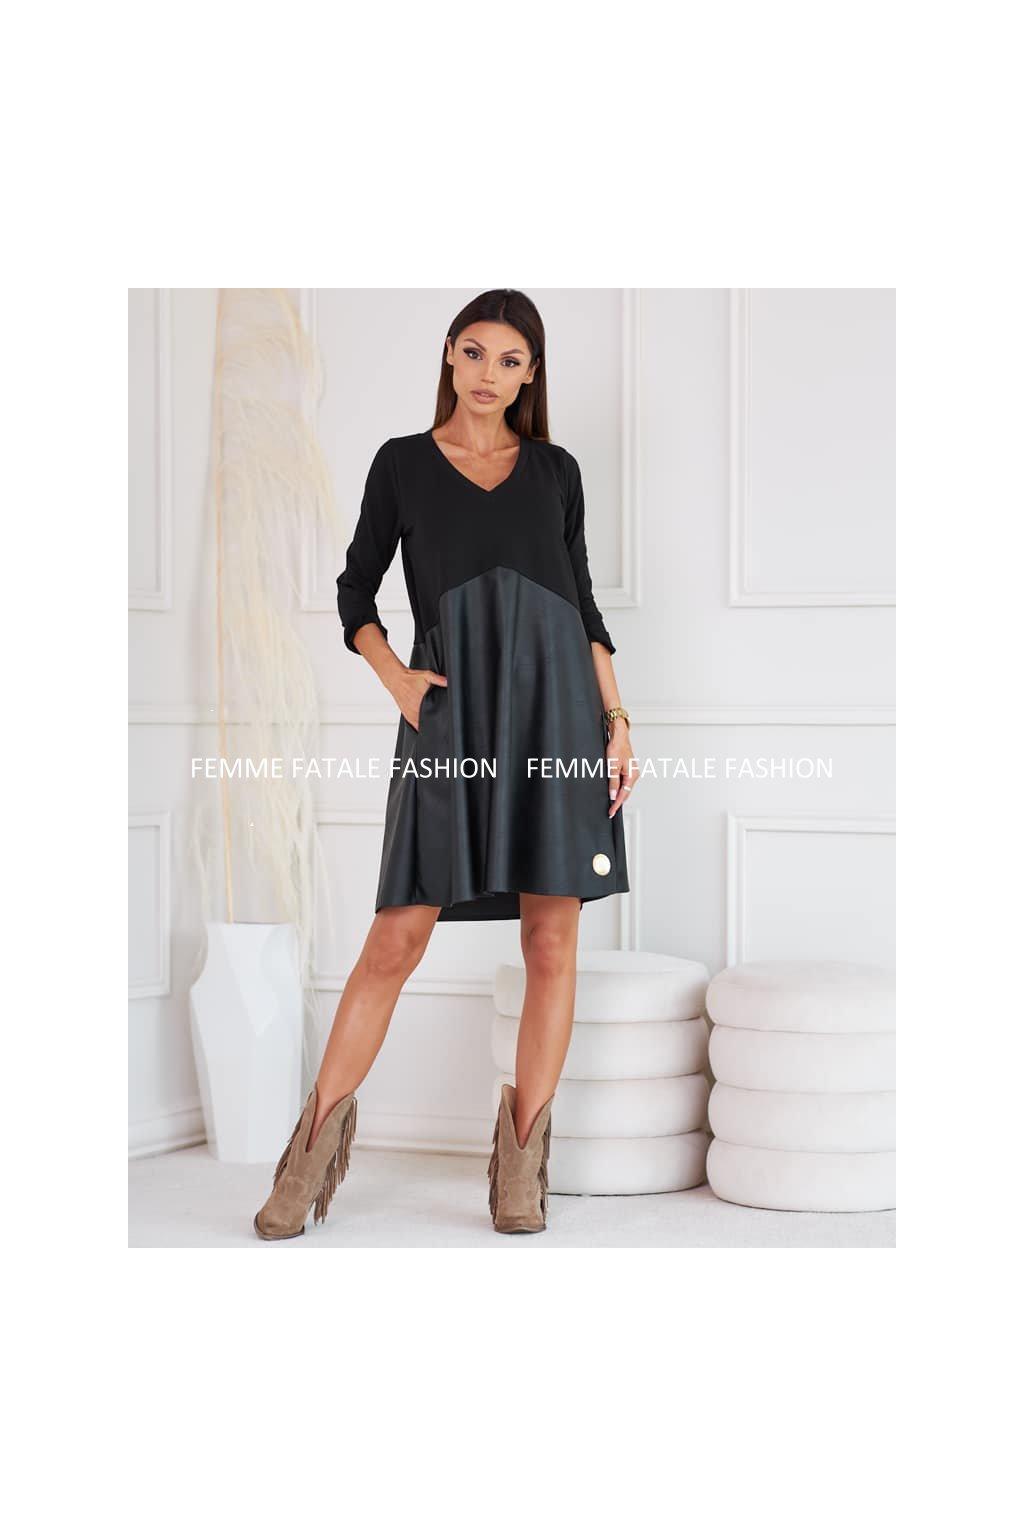 Dámské kombinované šaty GAYA femmefatalefashion (1)